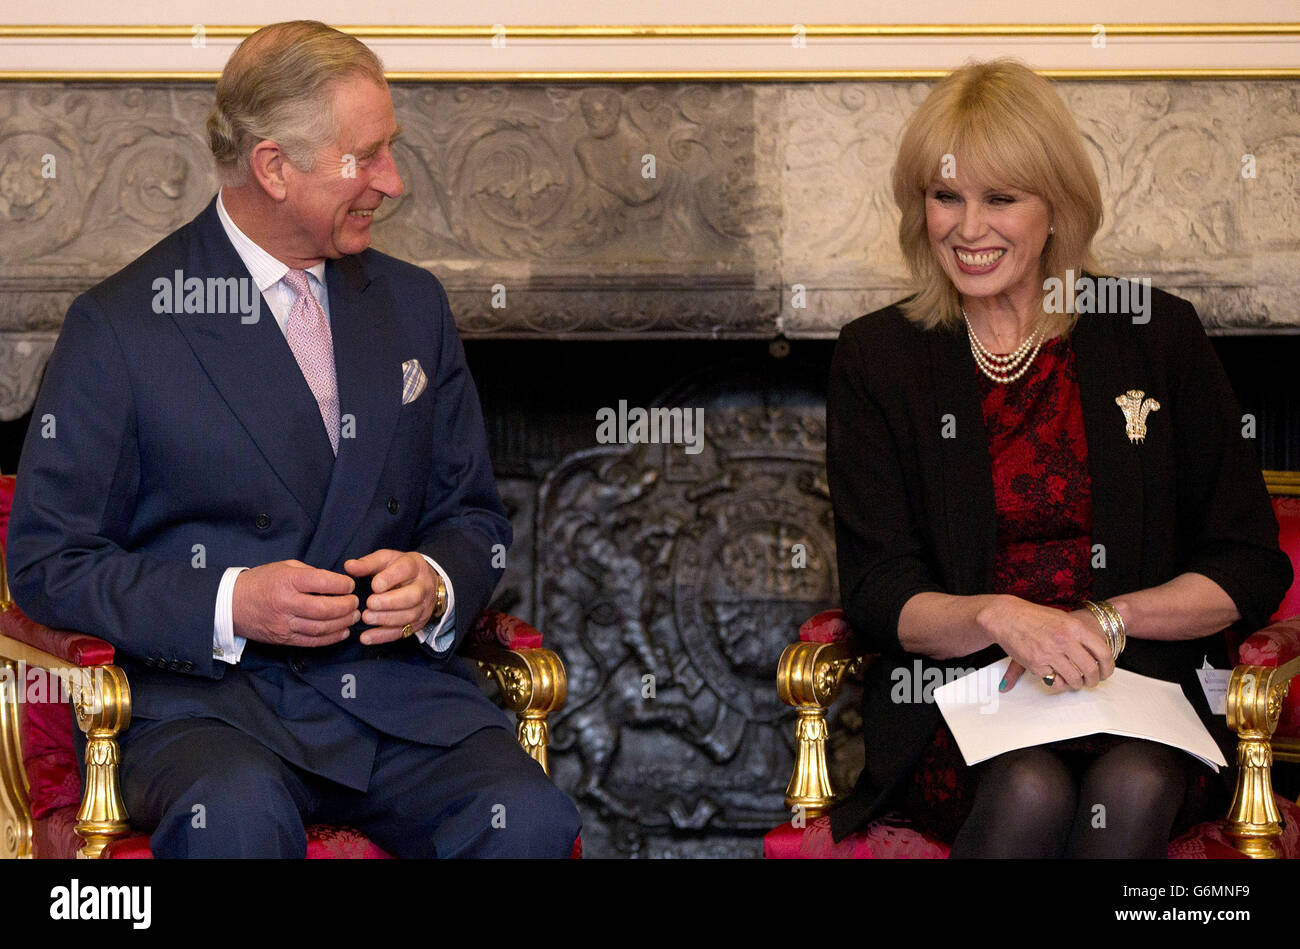 Prince Charles presents arts awards Stock Photo